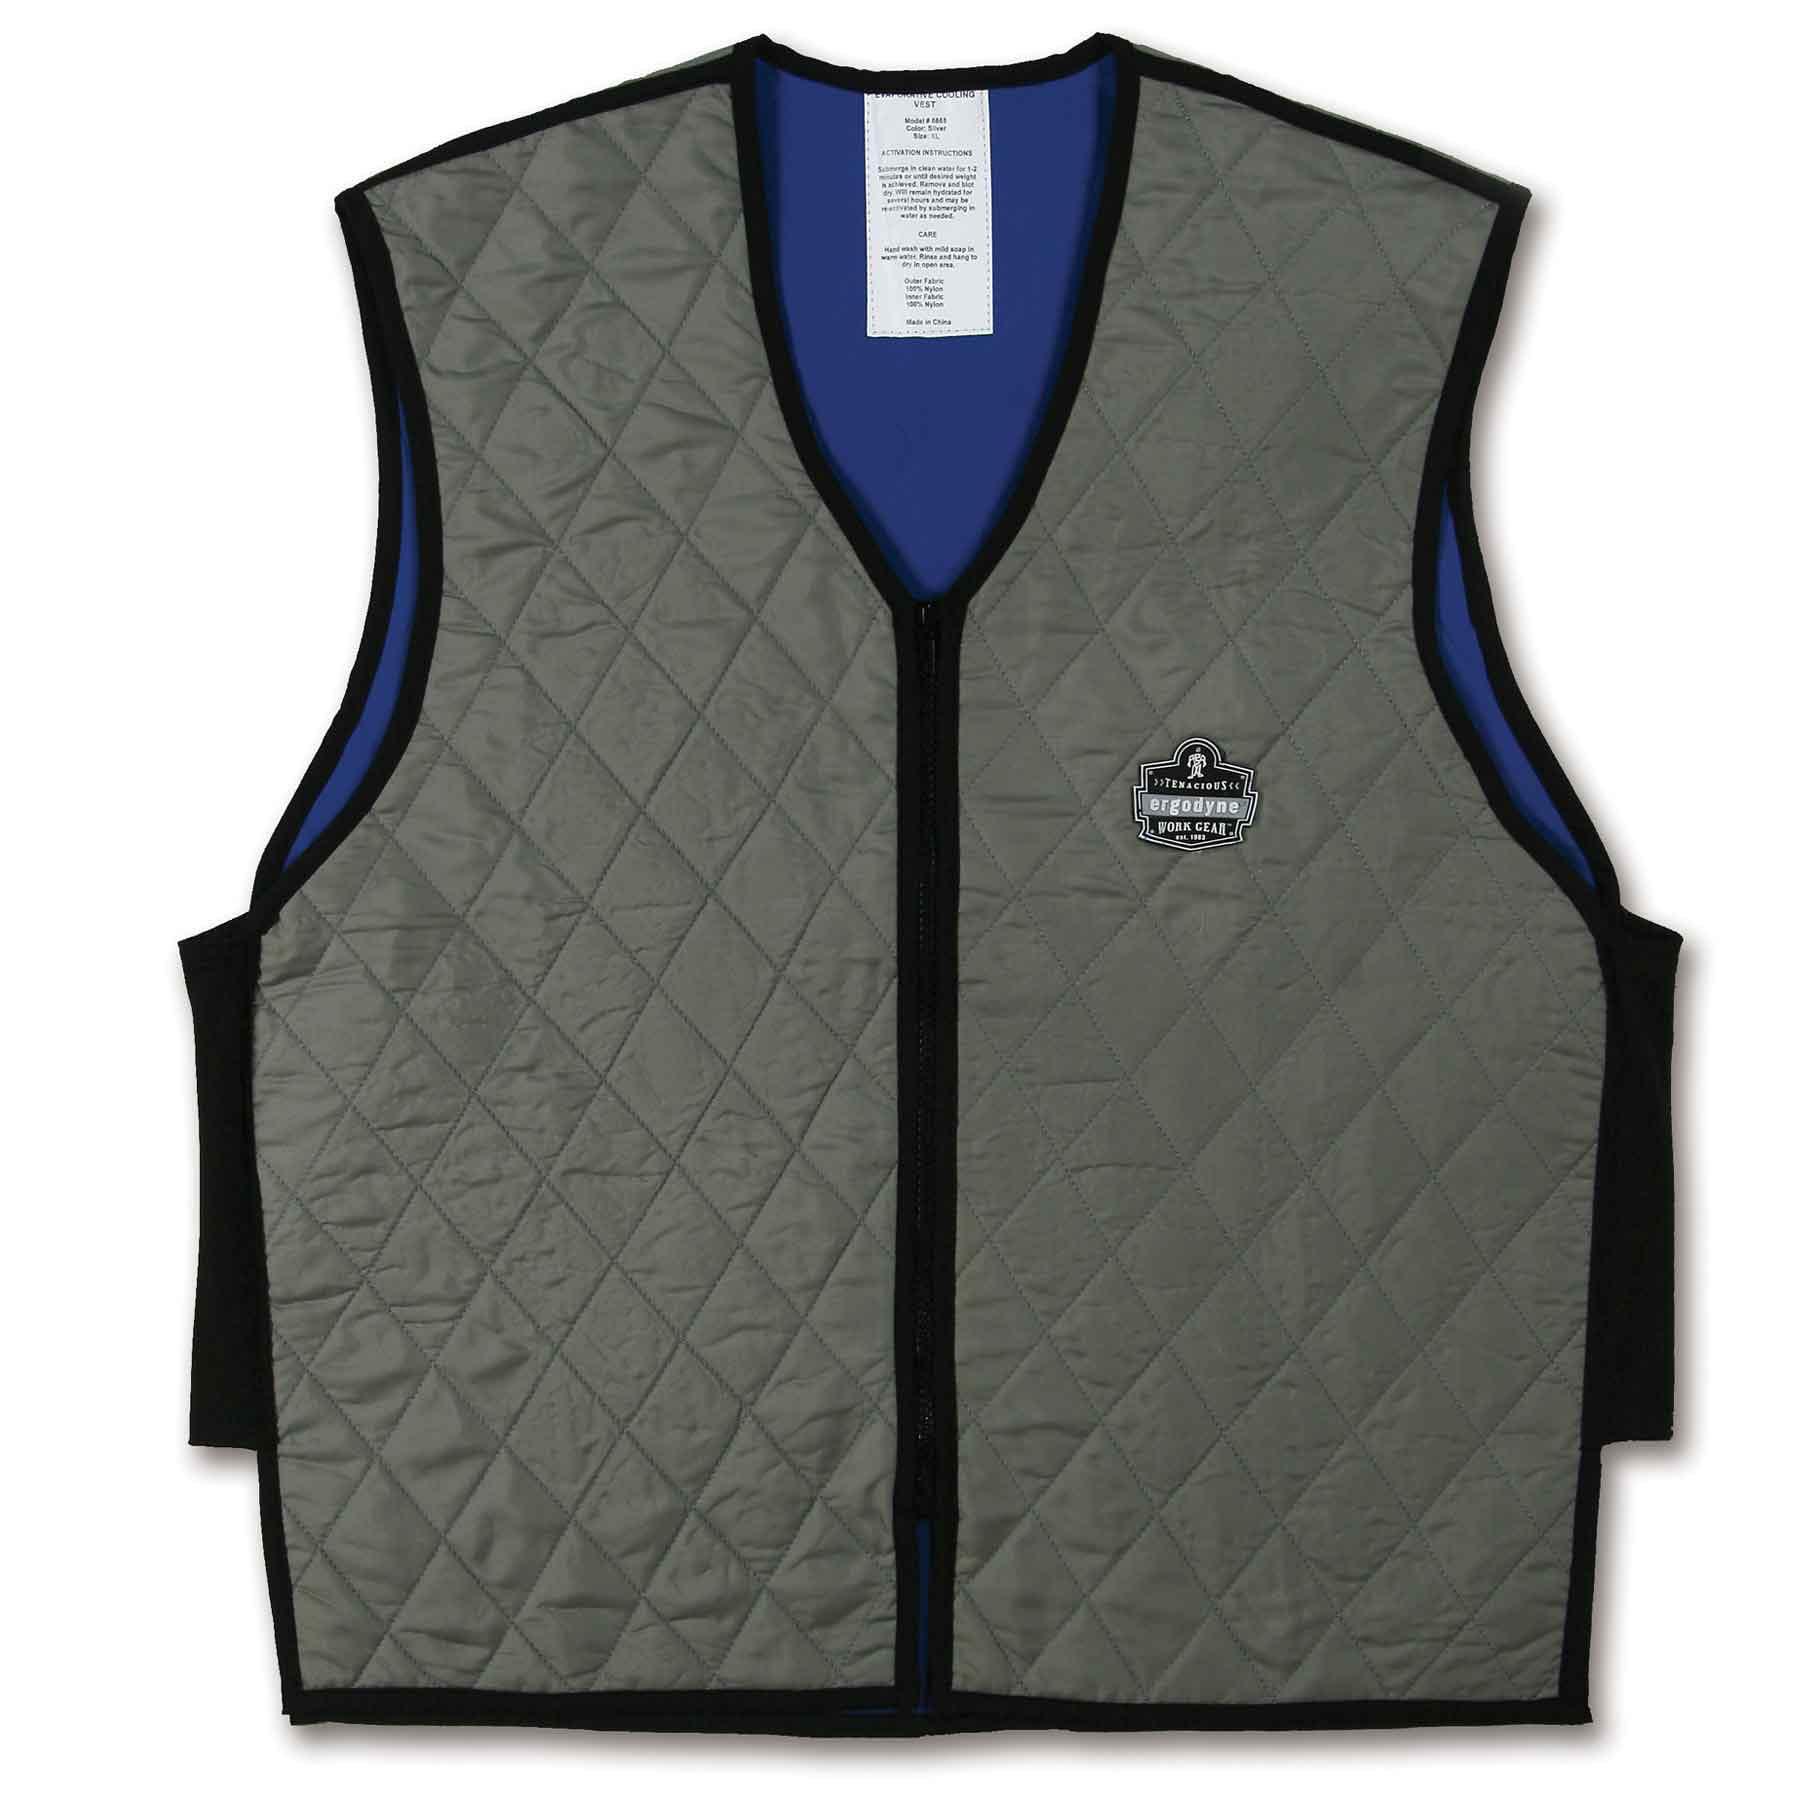 Ergodyne Chill-Its® 6665 Evaporative Cooling Vest, Gray, 2XL